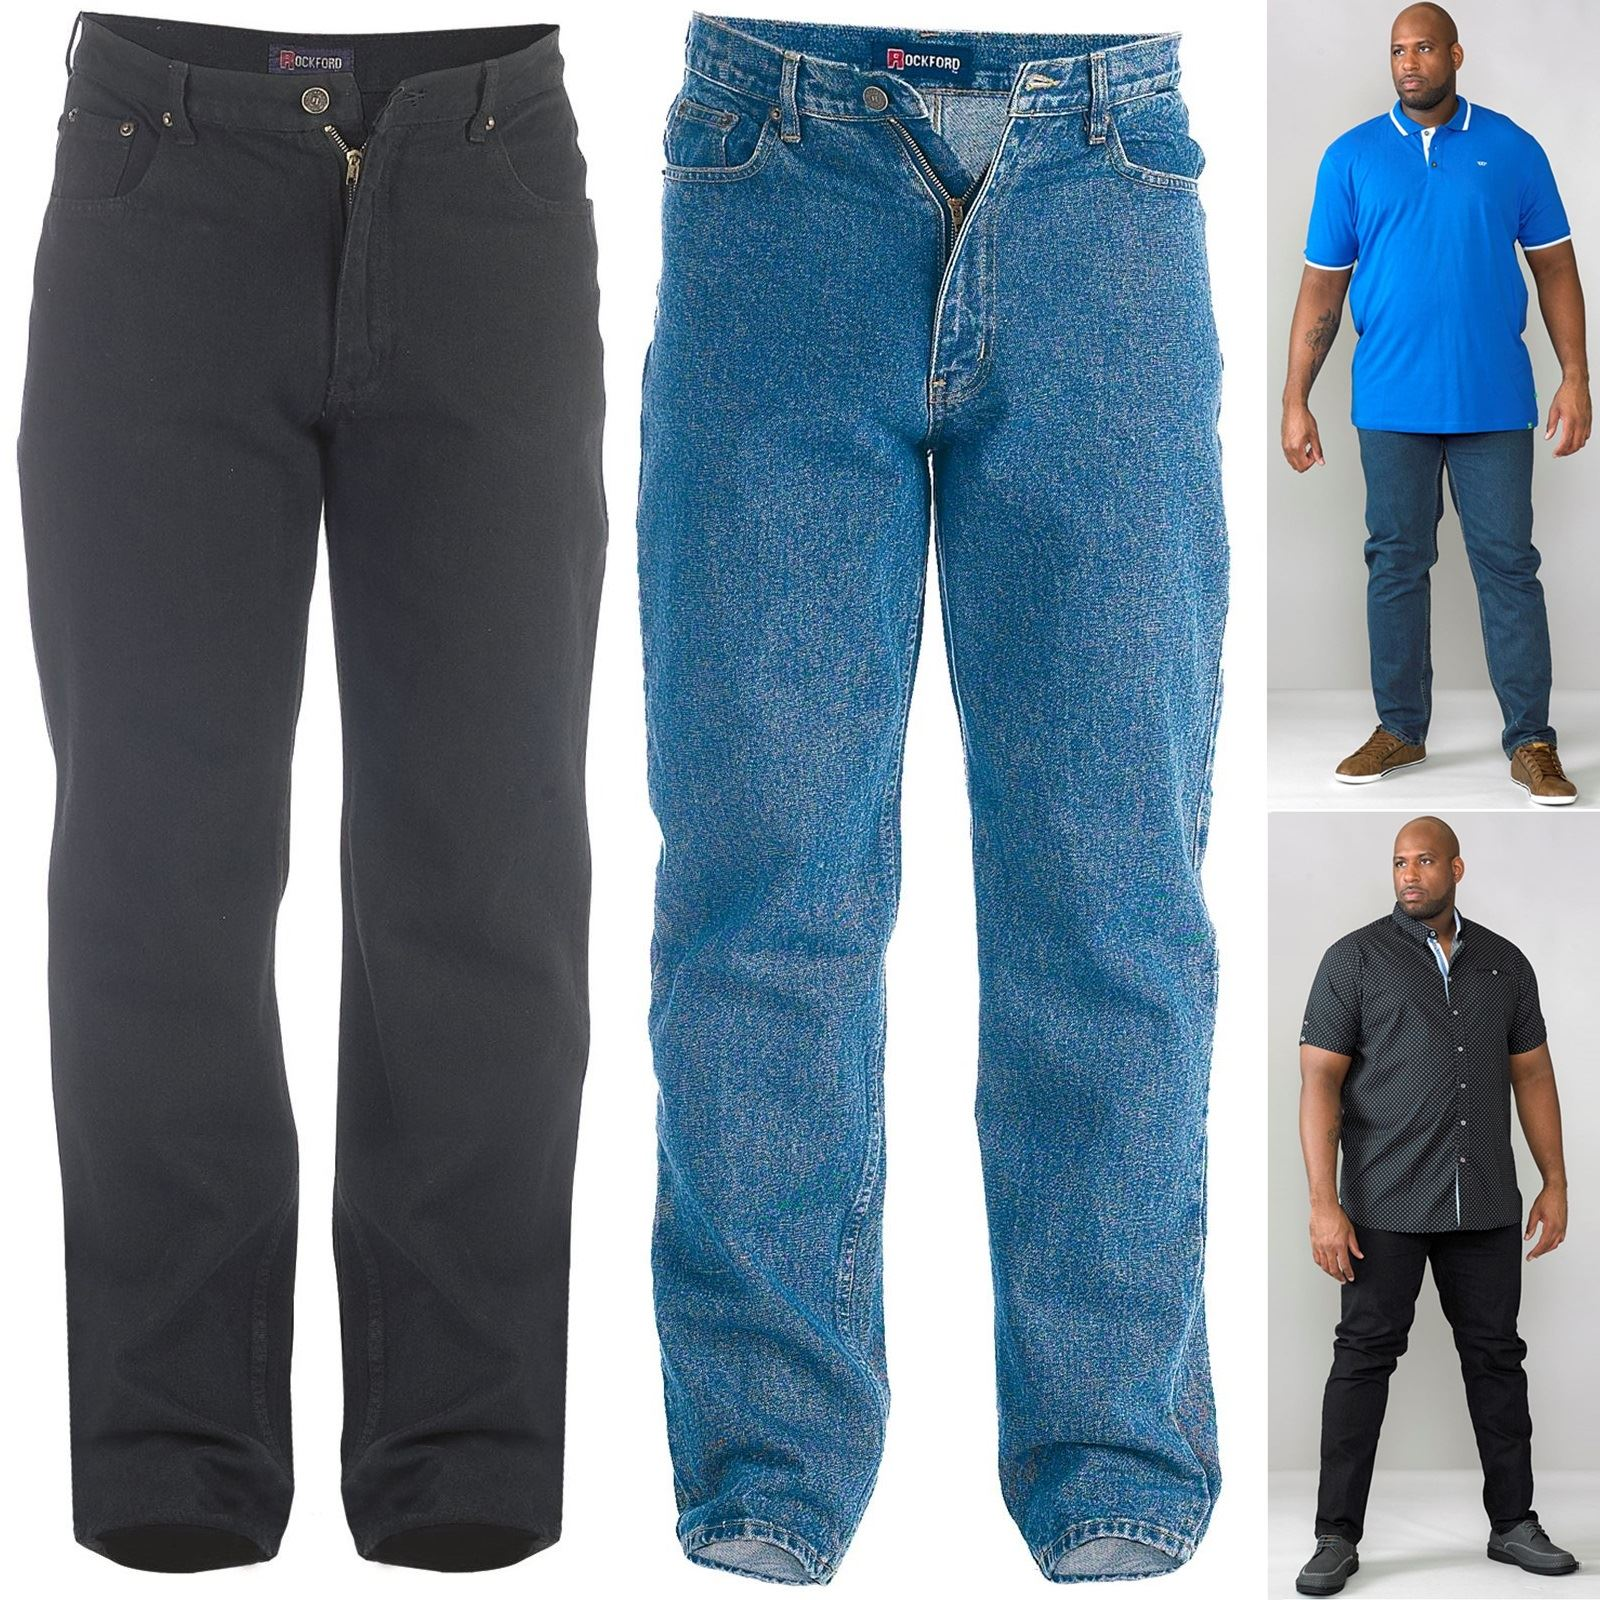 New Mens King//Big Rockford Comfort Fit Denim Jeans Black Blue waist  Size 42 54